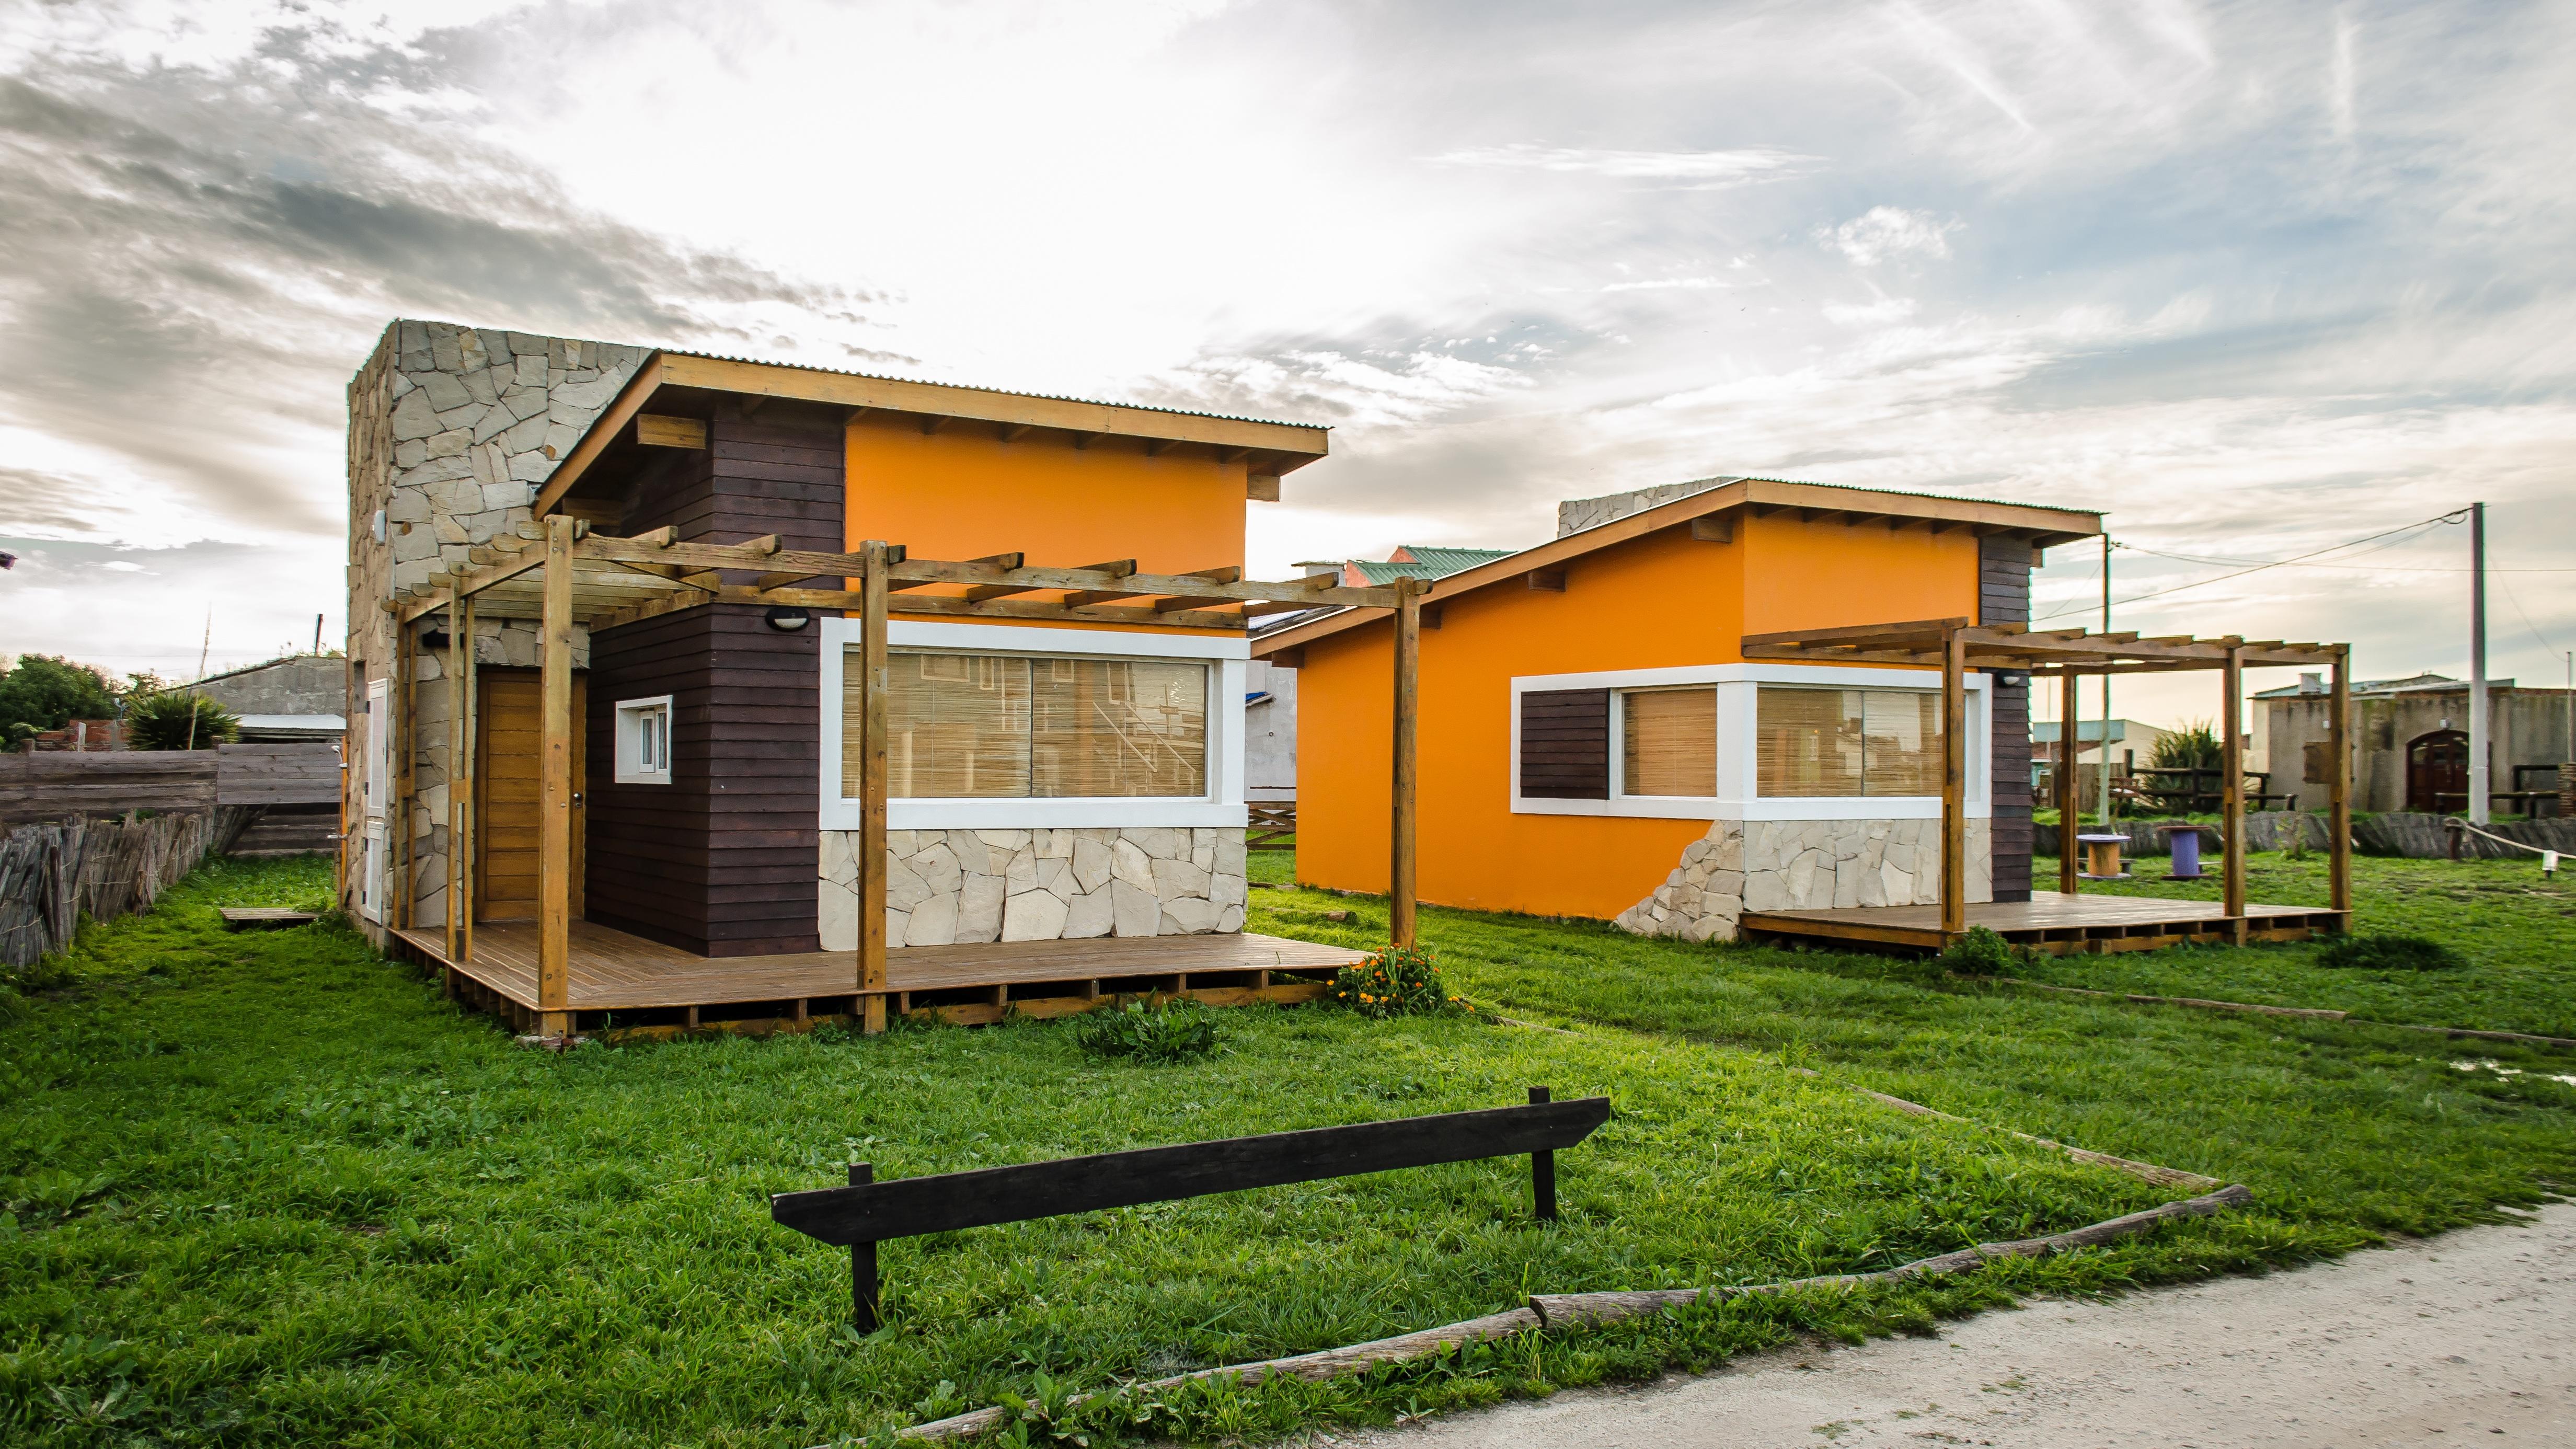 Fotos Gratis Paisaje Arquitectura Villa Edificio Urbano